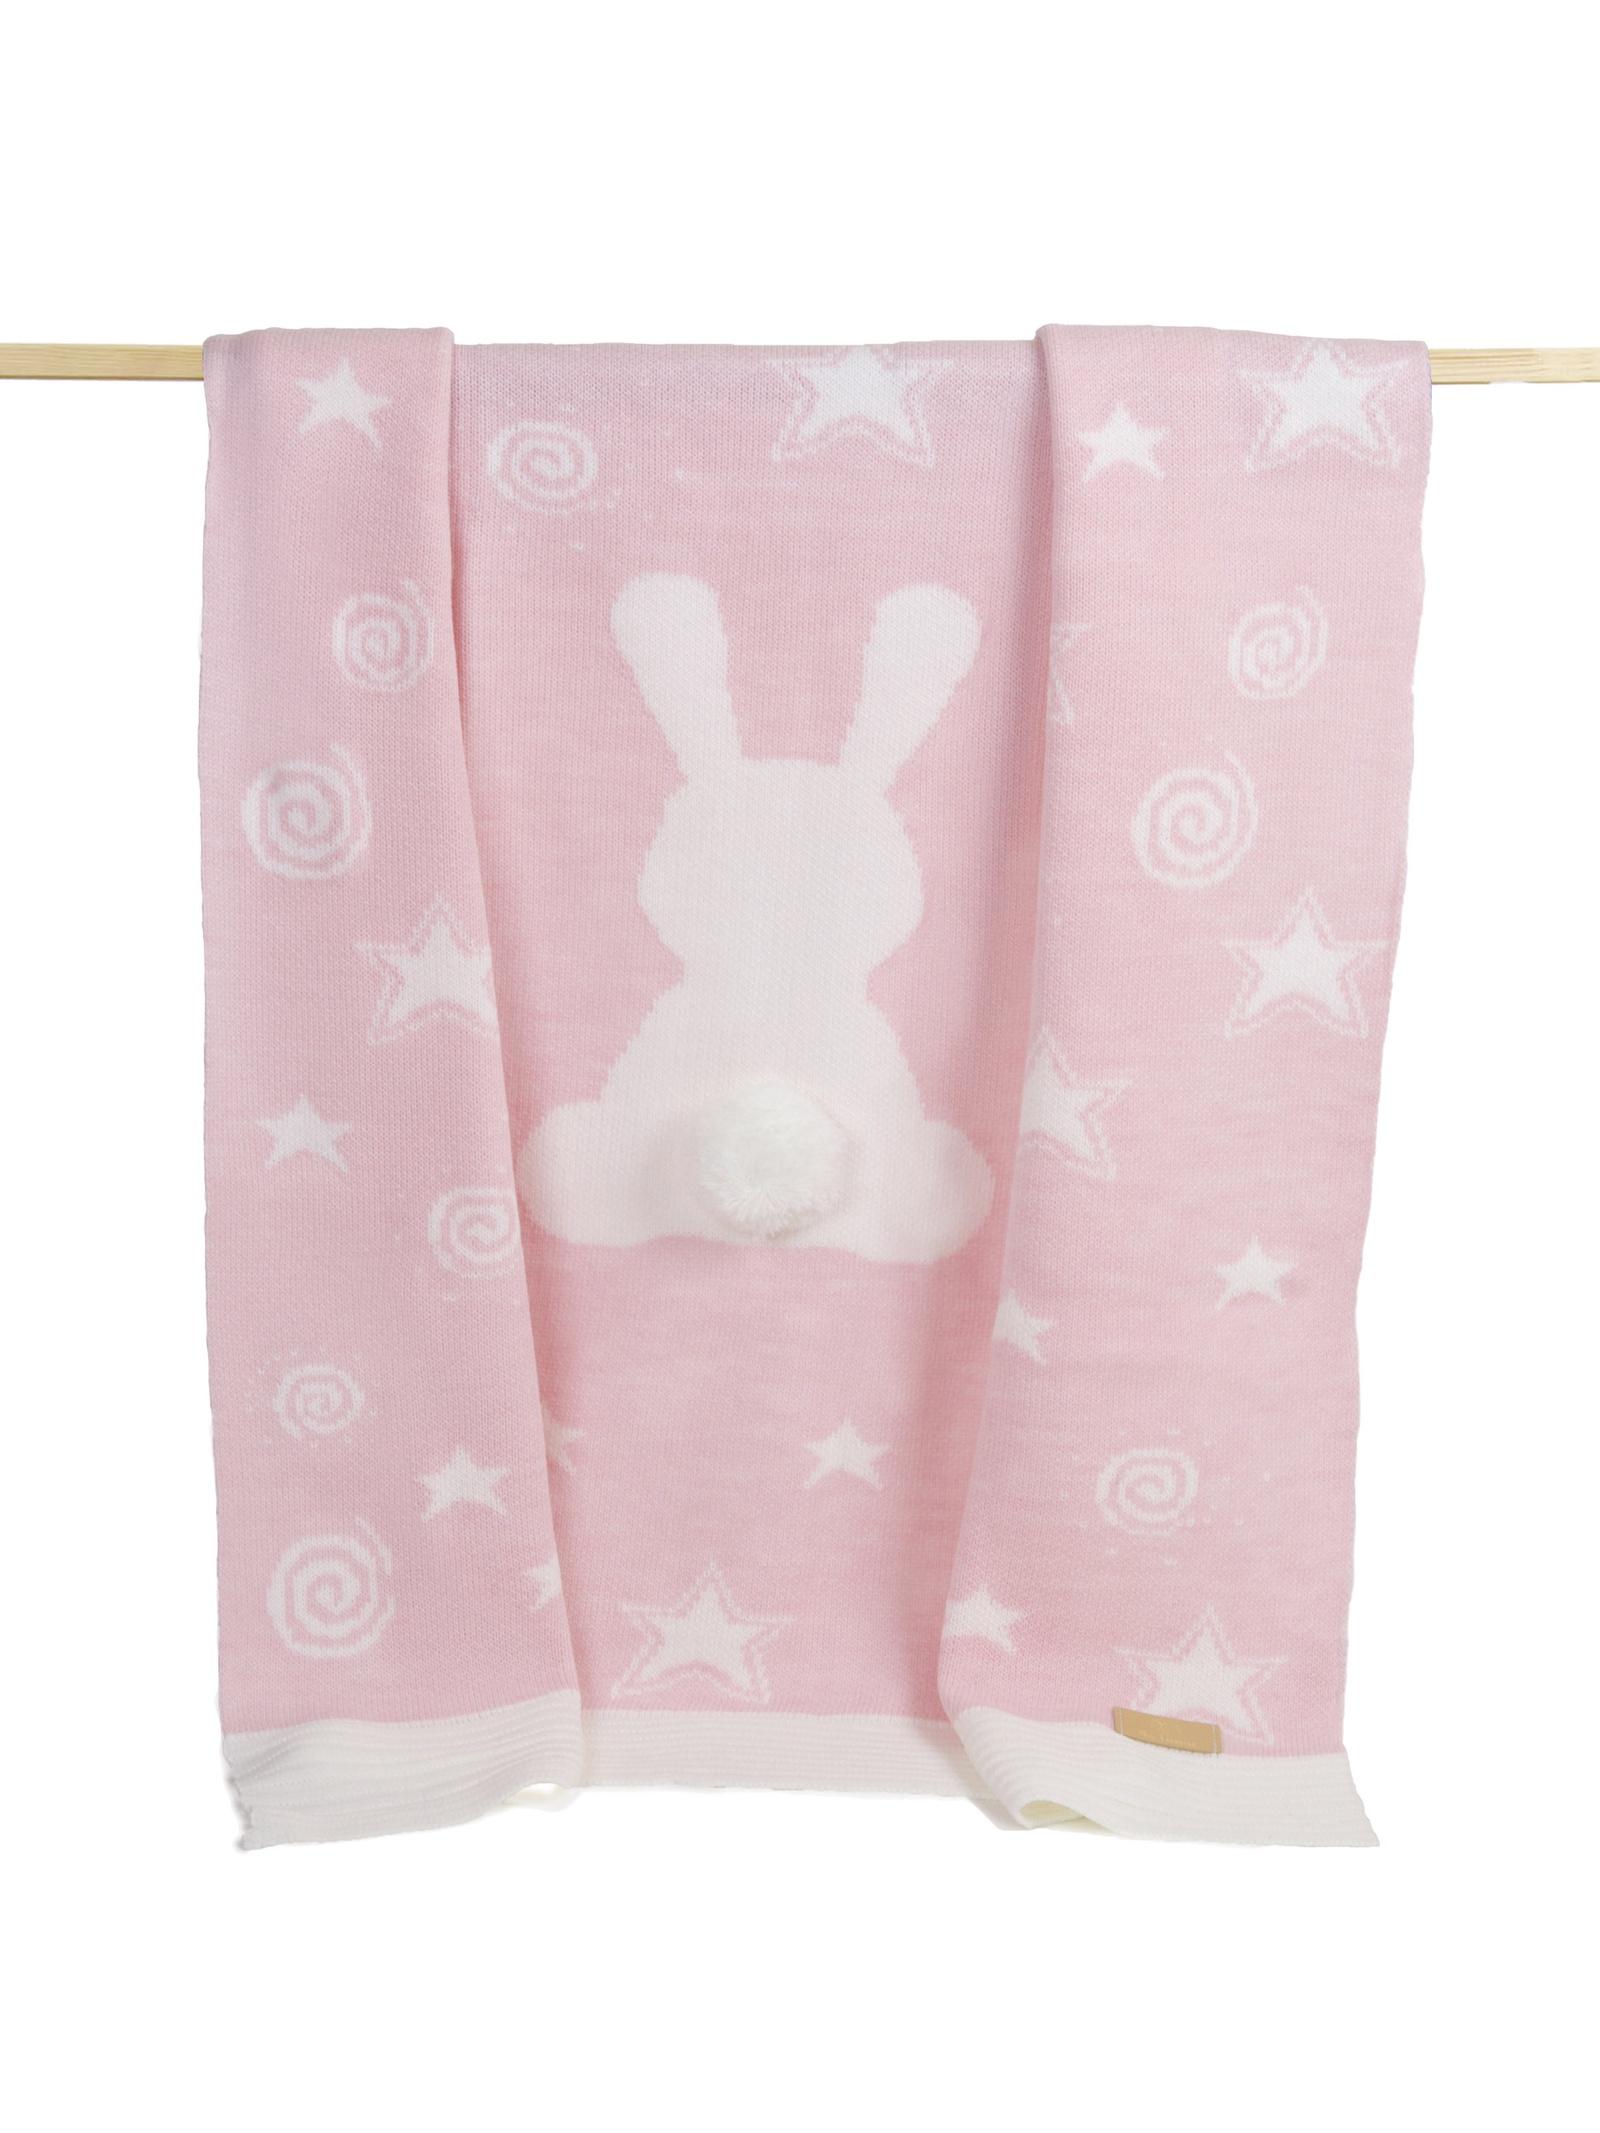 детские кроватки Плед детский Ma Licorne Lapin Rose (розовый), 1х1 м